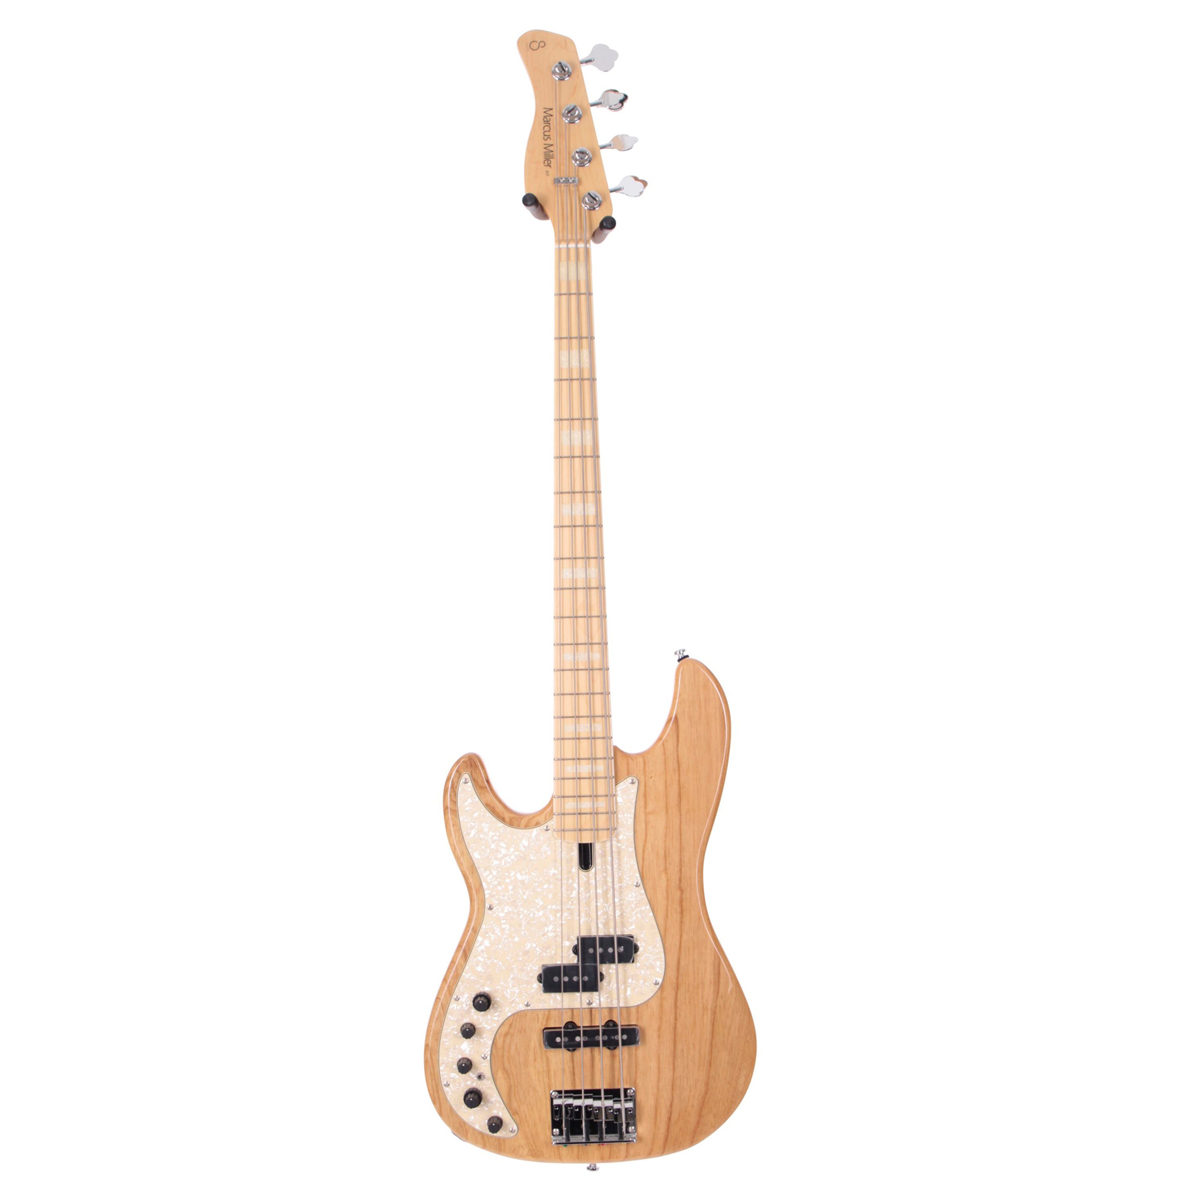 Sire Marcus Miller P7 SWAMP ASH-4 LH NT el-bas, venstrehåndet natur